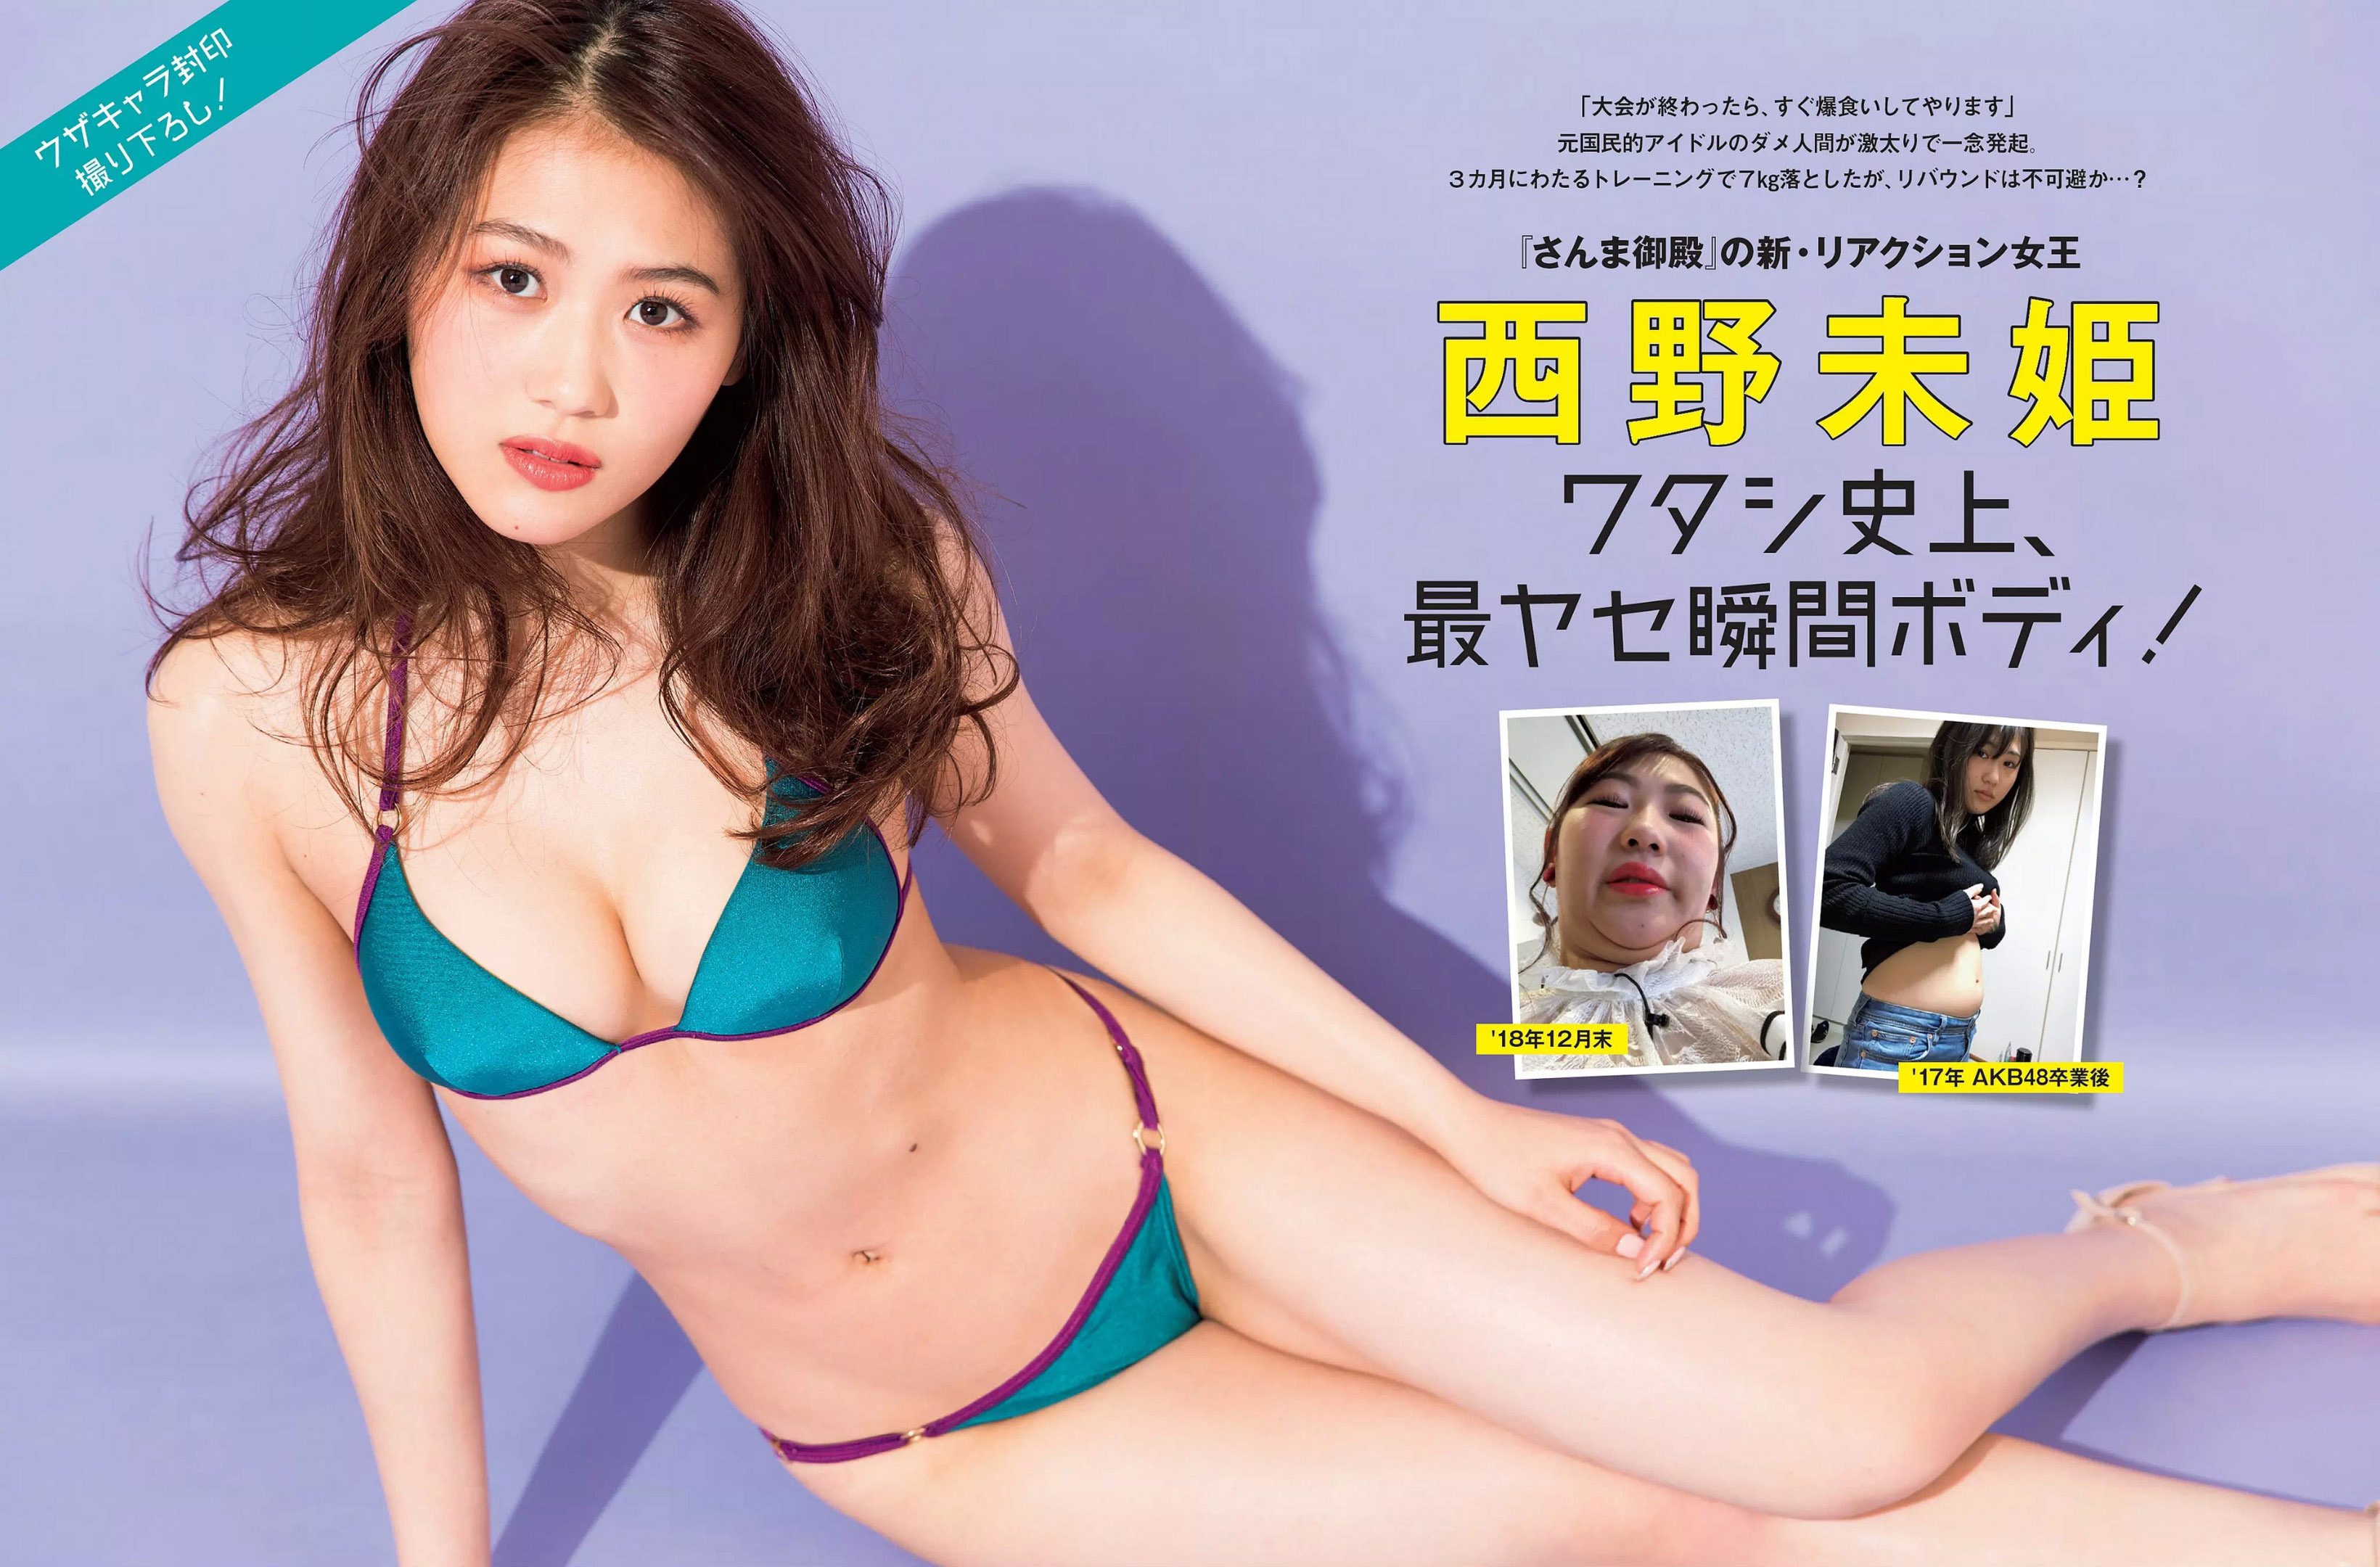 Miki Nishino Flash 190423 01.jpg